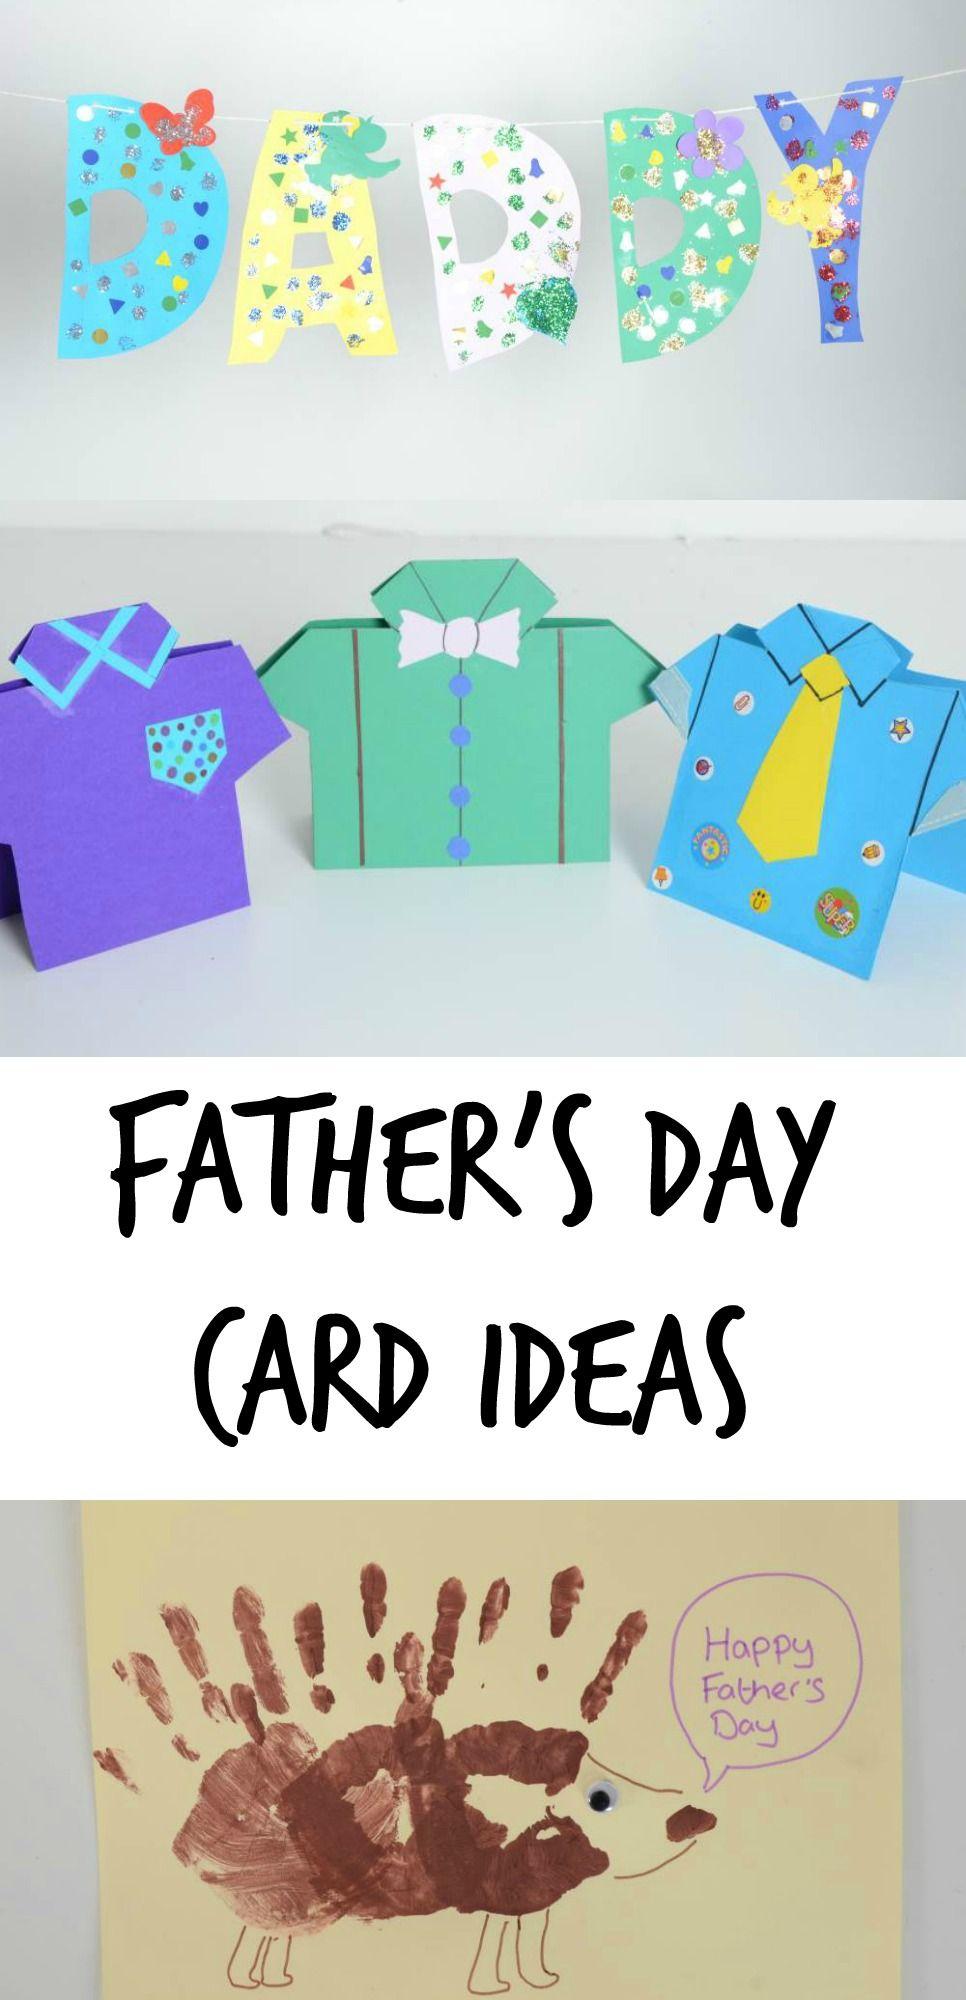 Fathers day card ideas learningisfun earlyyears cards